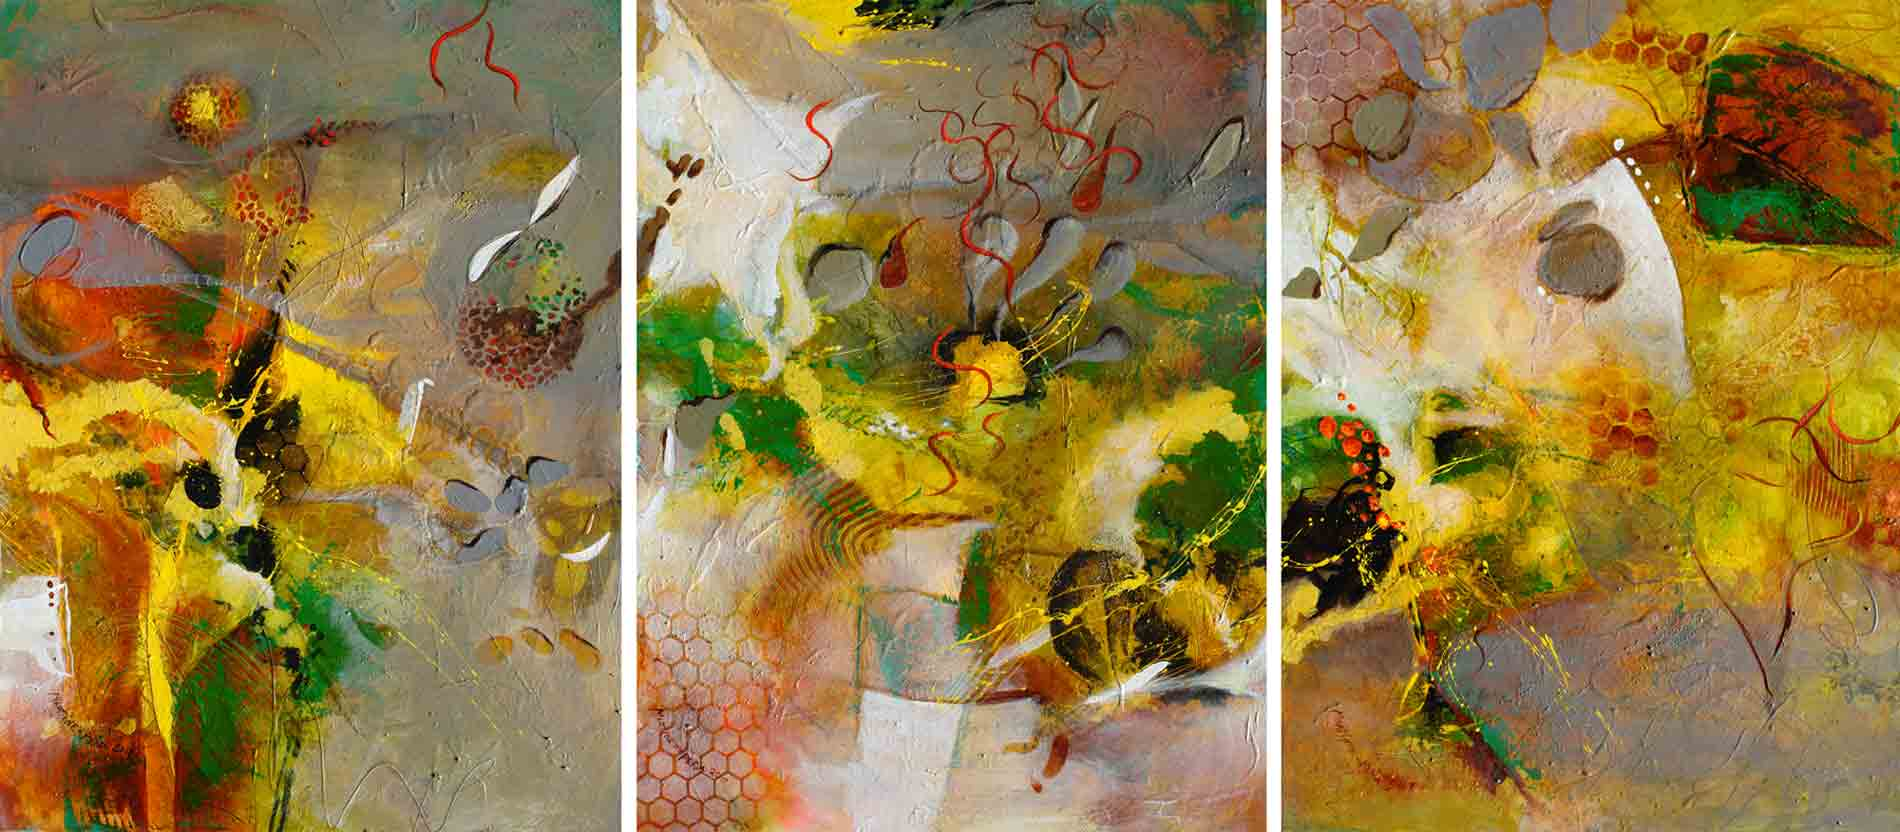 Alborada V to VII-Triptych (SOLD)